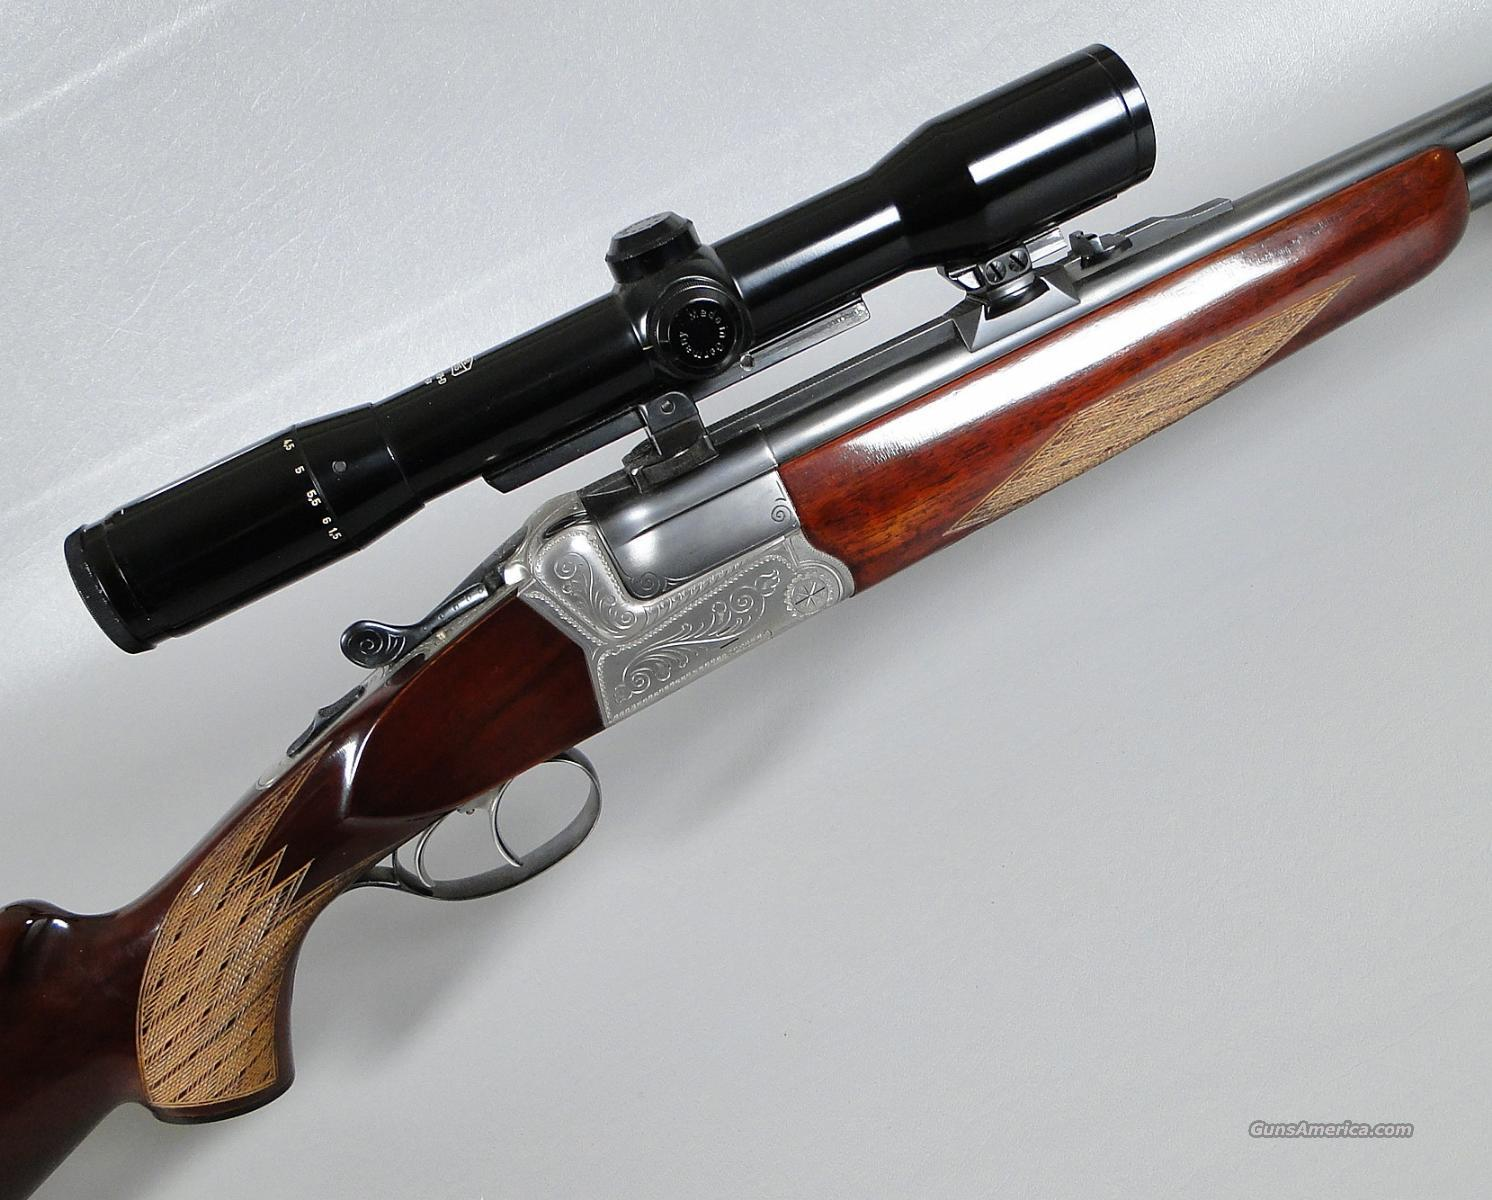 KRIEGHOFF Tech Double Rifle in 375 H&H with Zeiss Scope  Guns > Rifles > Krieghoff Rifles